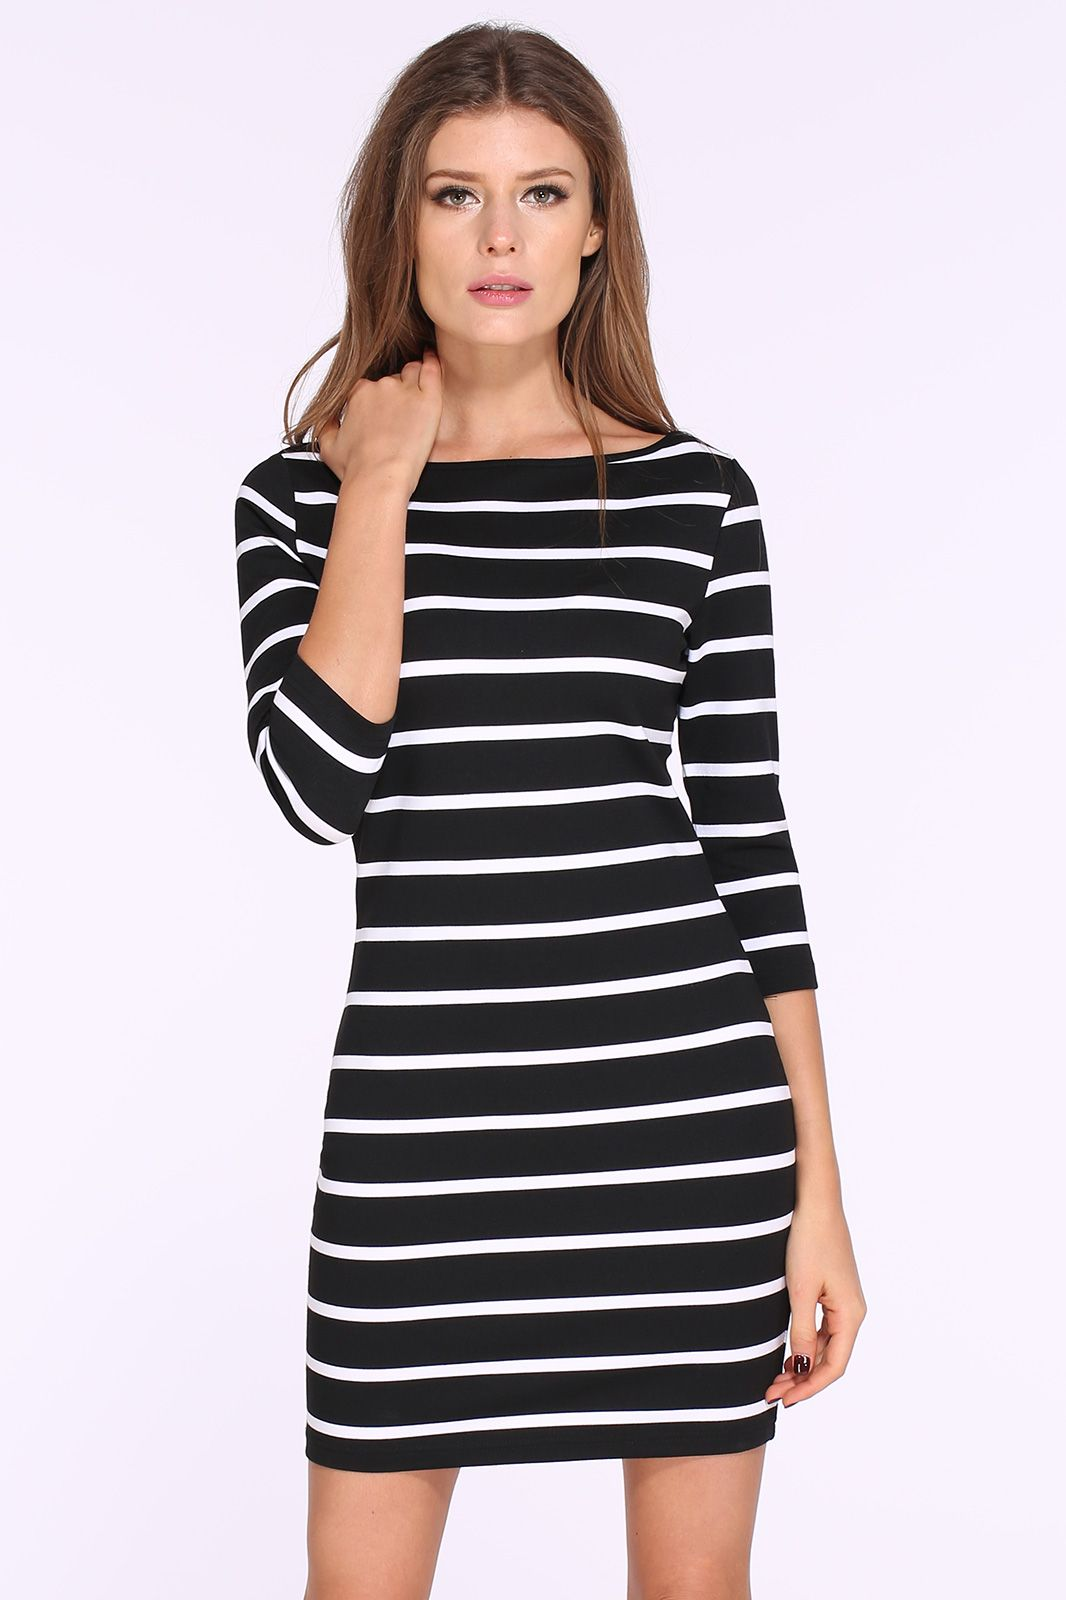 Black and white striped bodycon dress teens jewelry catalog new